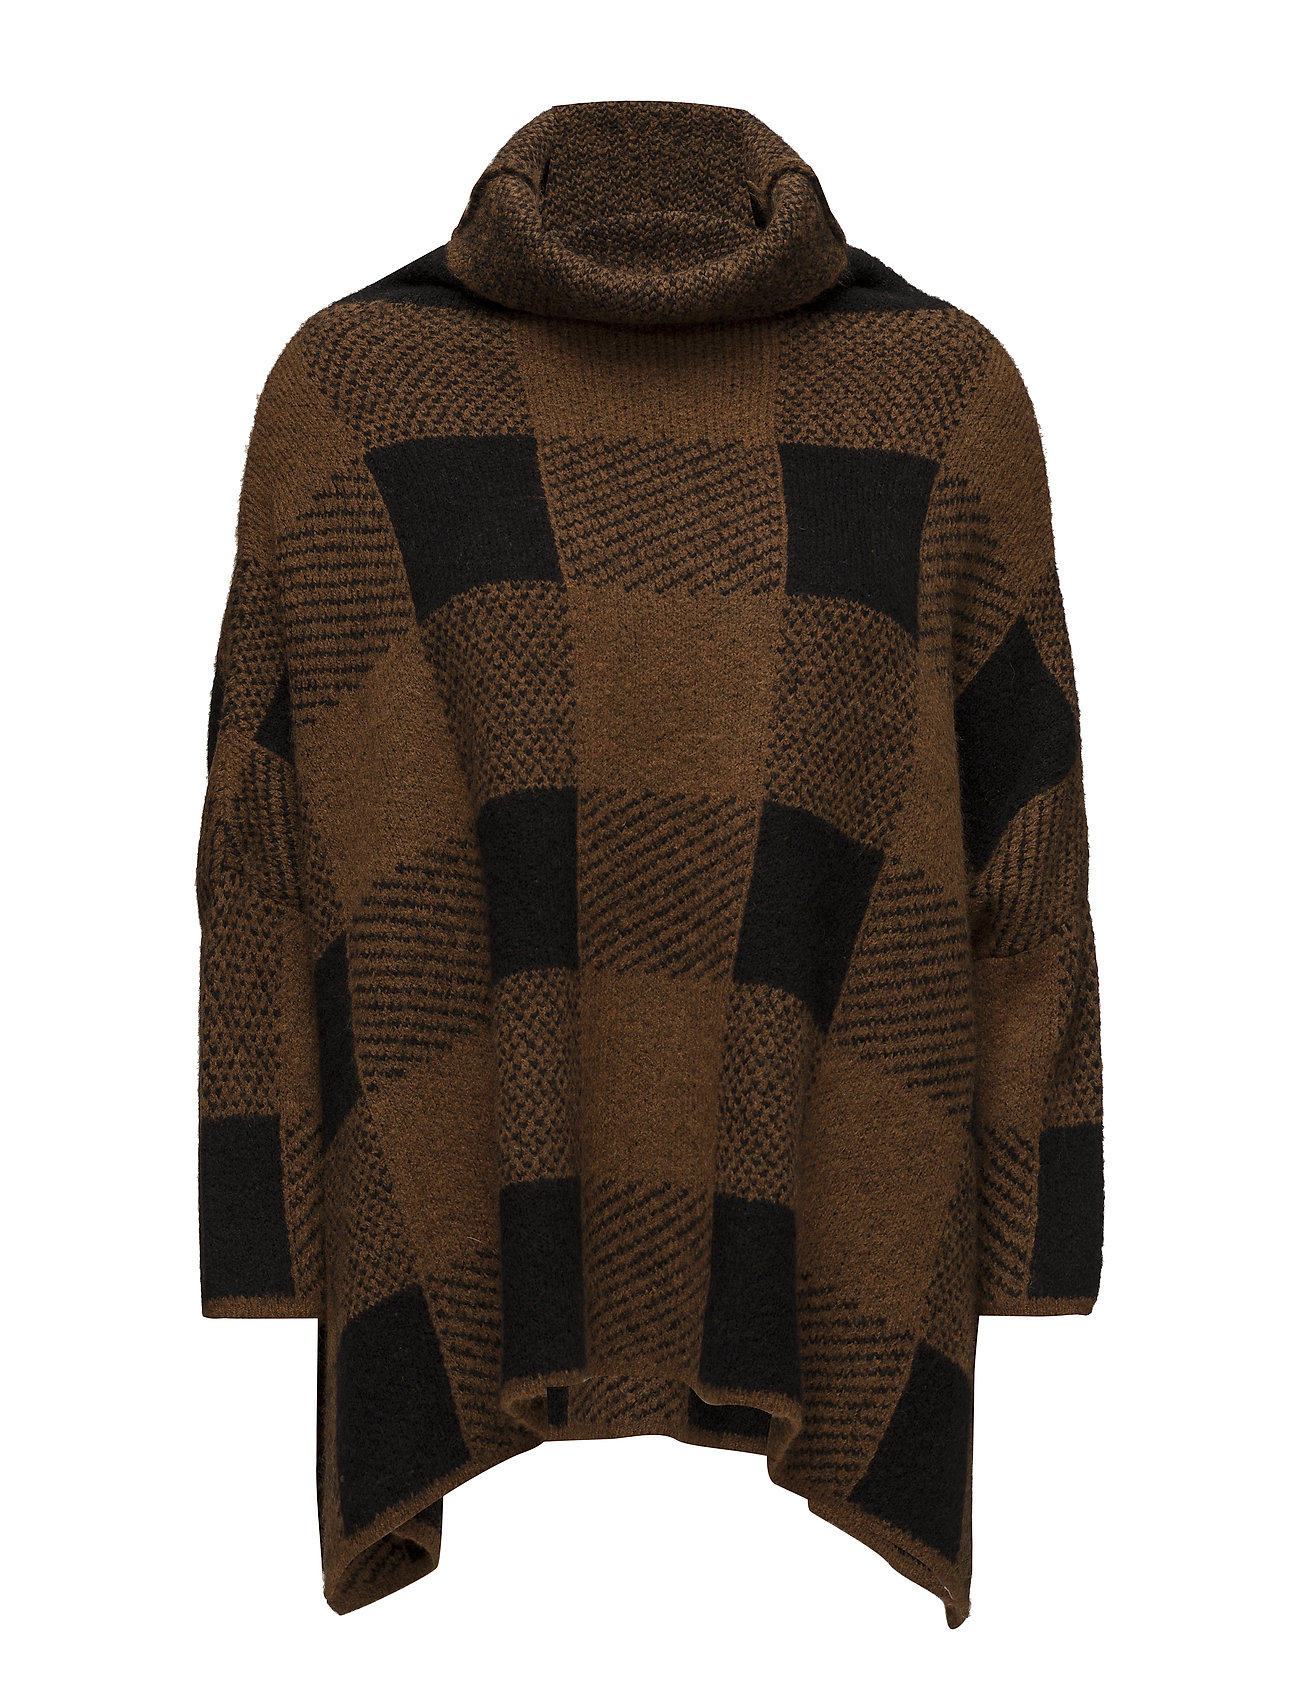 Rabens Saloner Blurred check tunic sweater - GLAZED GINGER